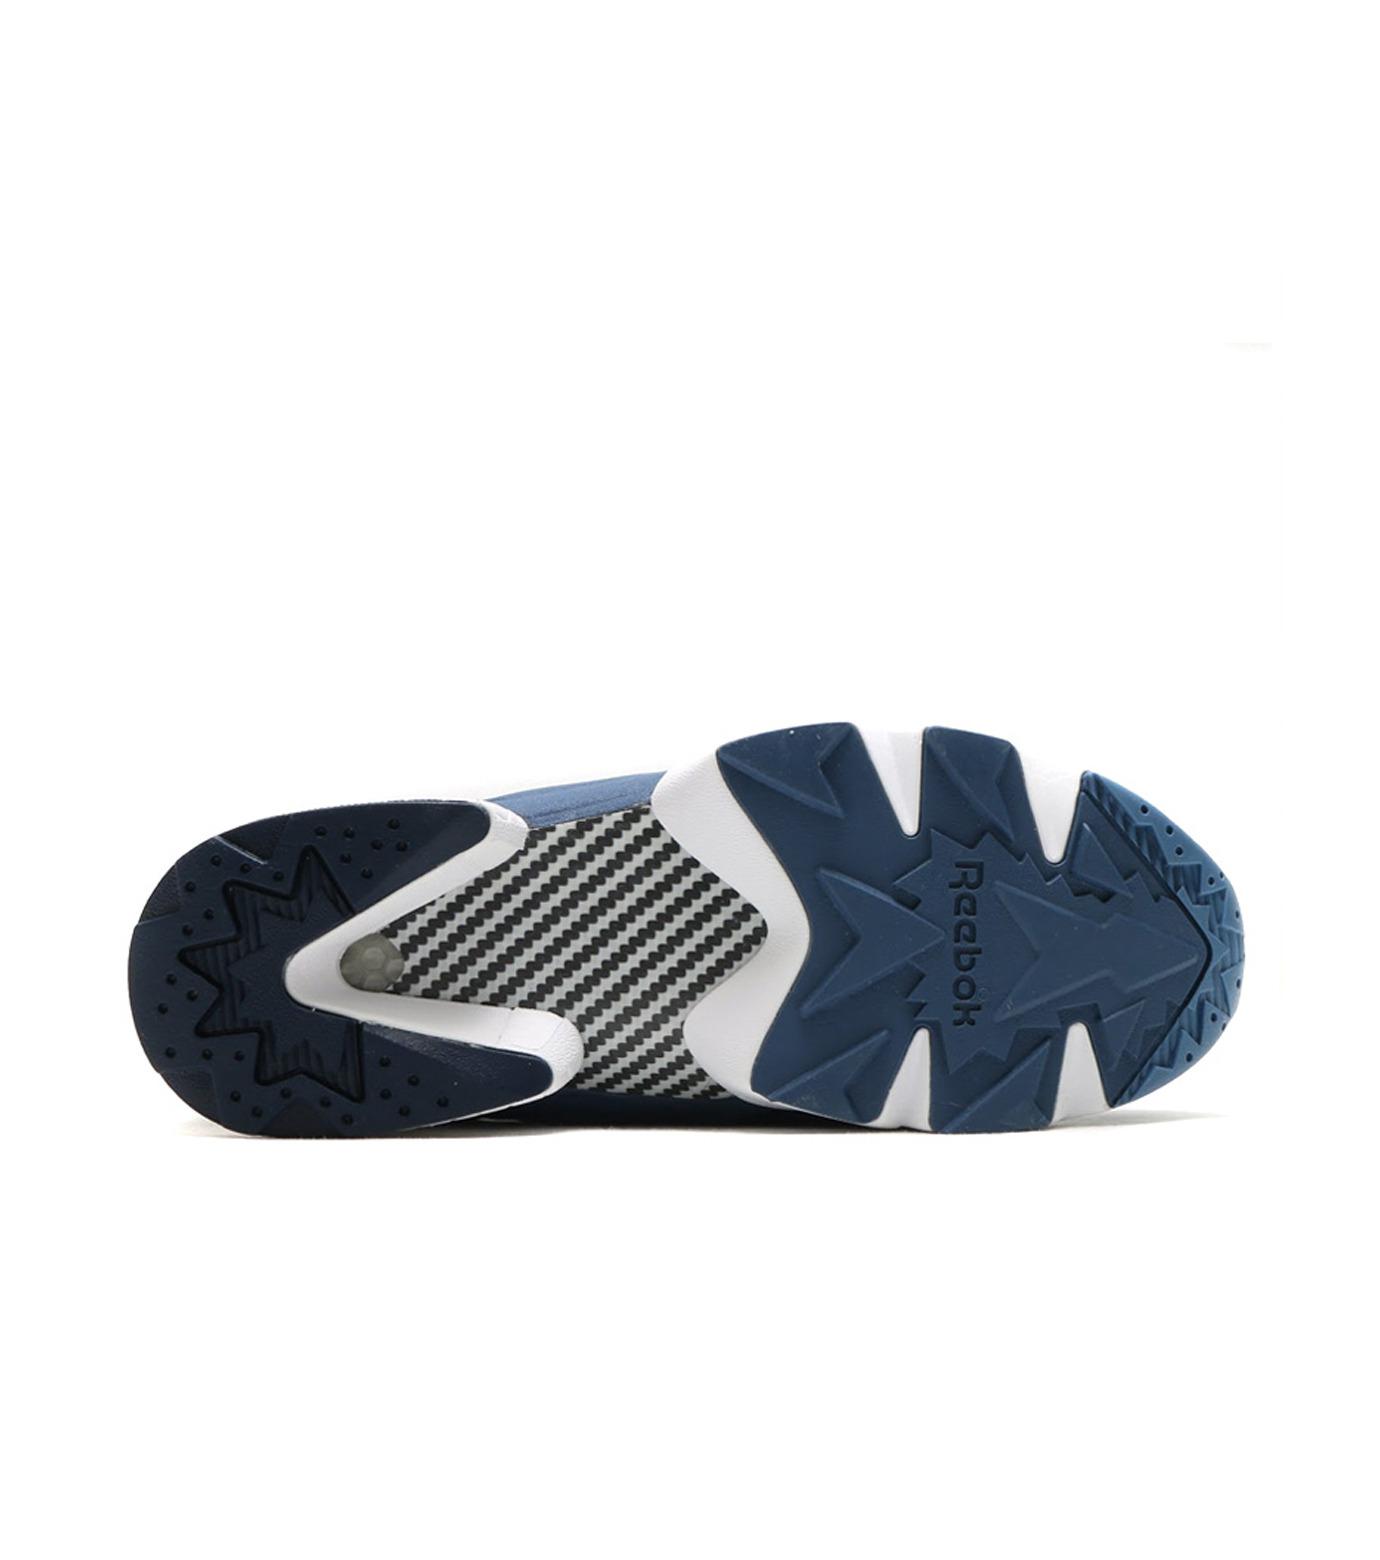 Reebok(リーボック)のINSTAPUMP FURY TECH-NAVY(シューズ/shoes)-AR0624-93 拡大詳細画像2